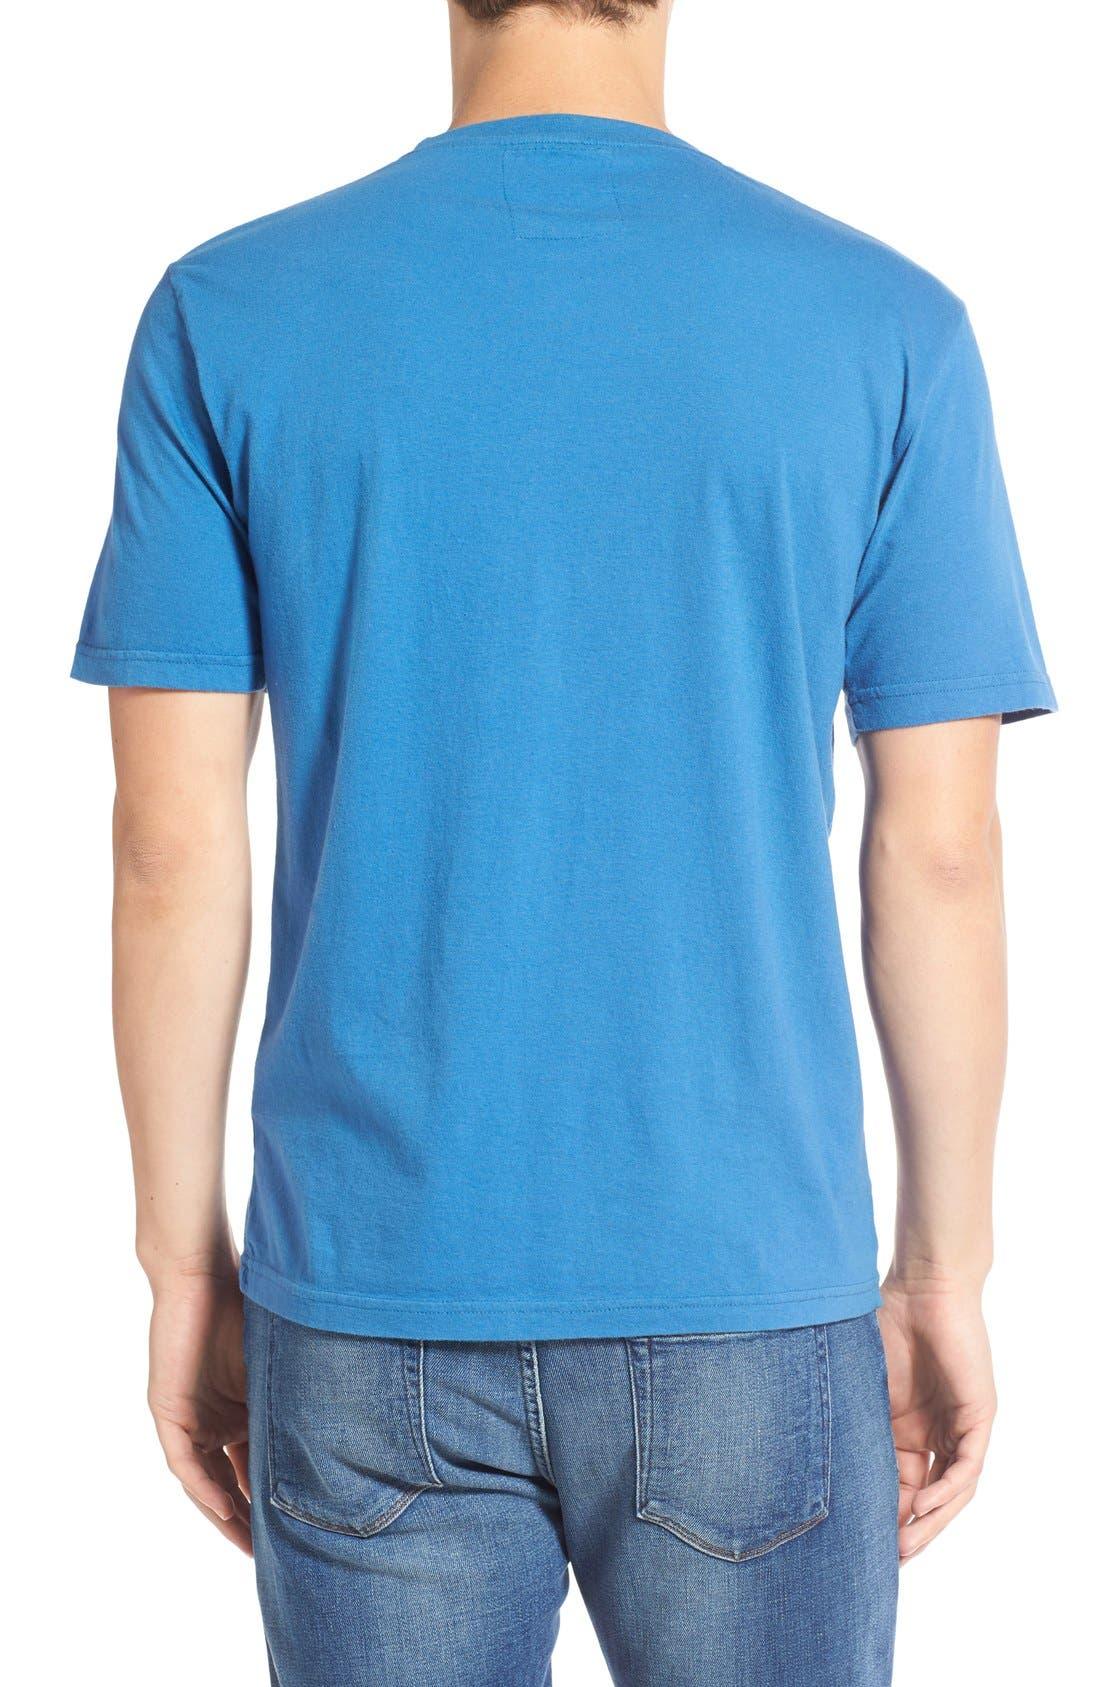 'Chicago Cubs - Brass Tacks' Trim Fit T-Shirt,                             Alternate thumbnail 2, color,                             450